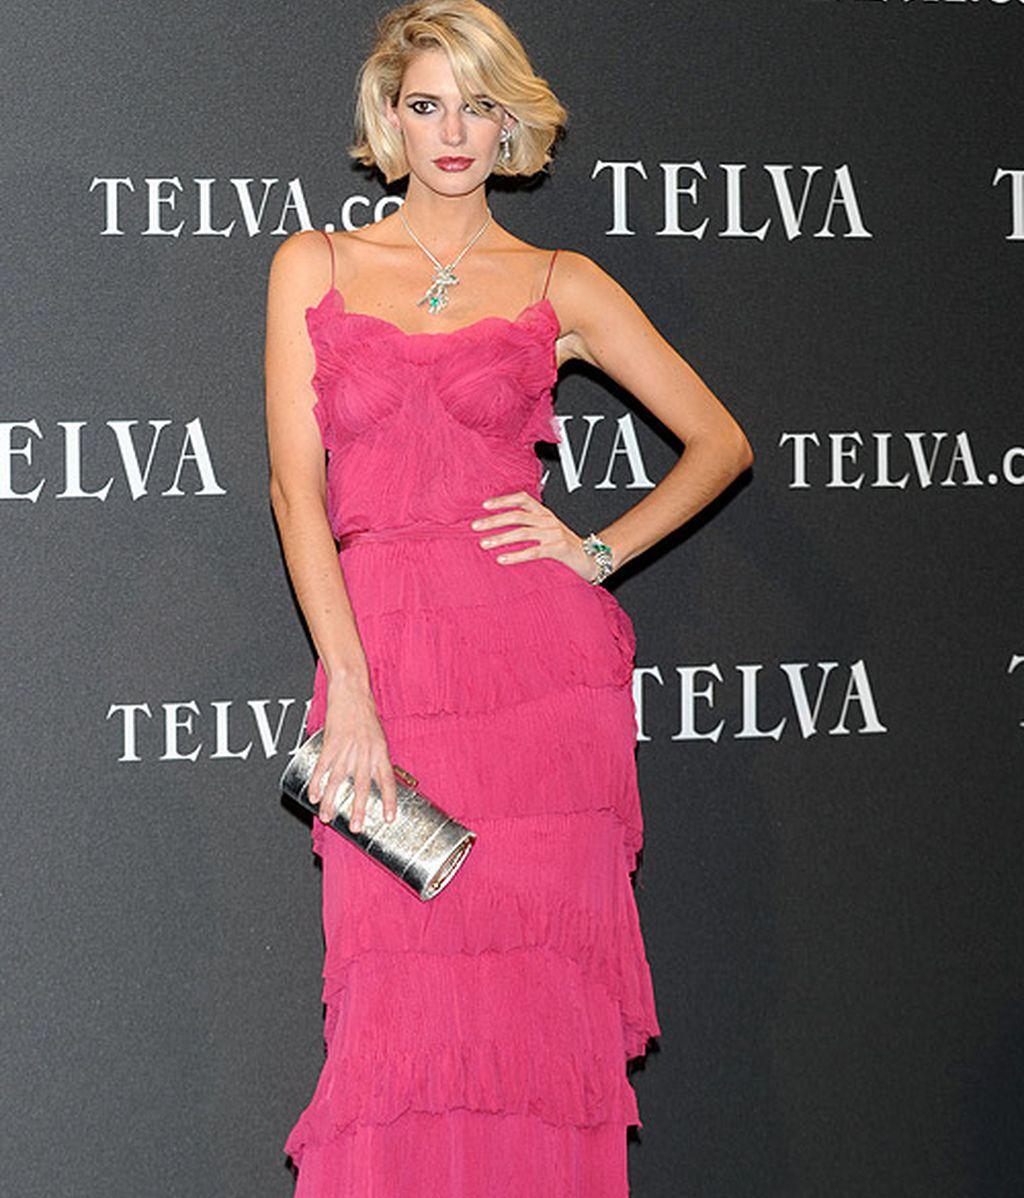 Glamour superlativo en los premios Telva